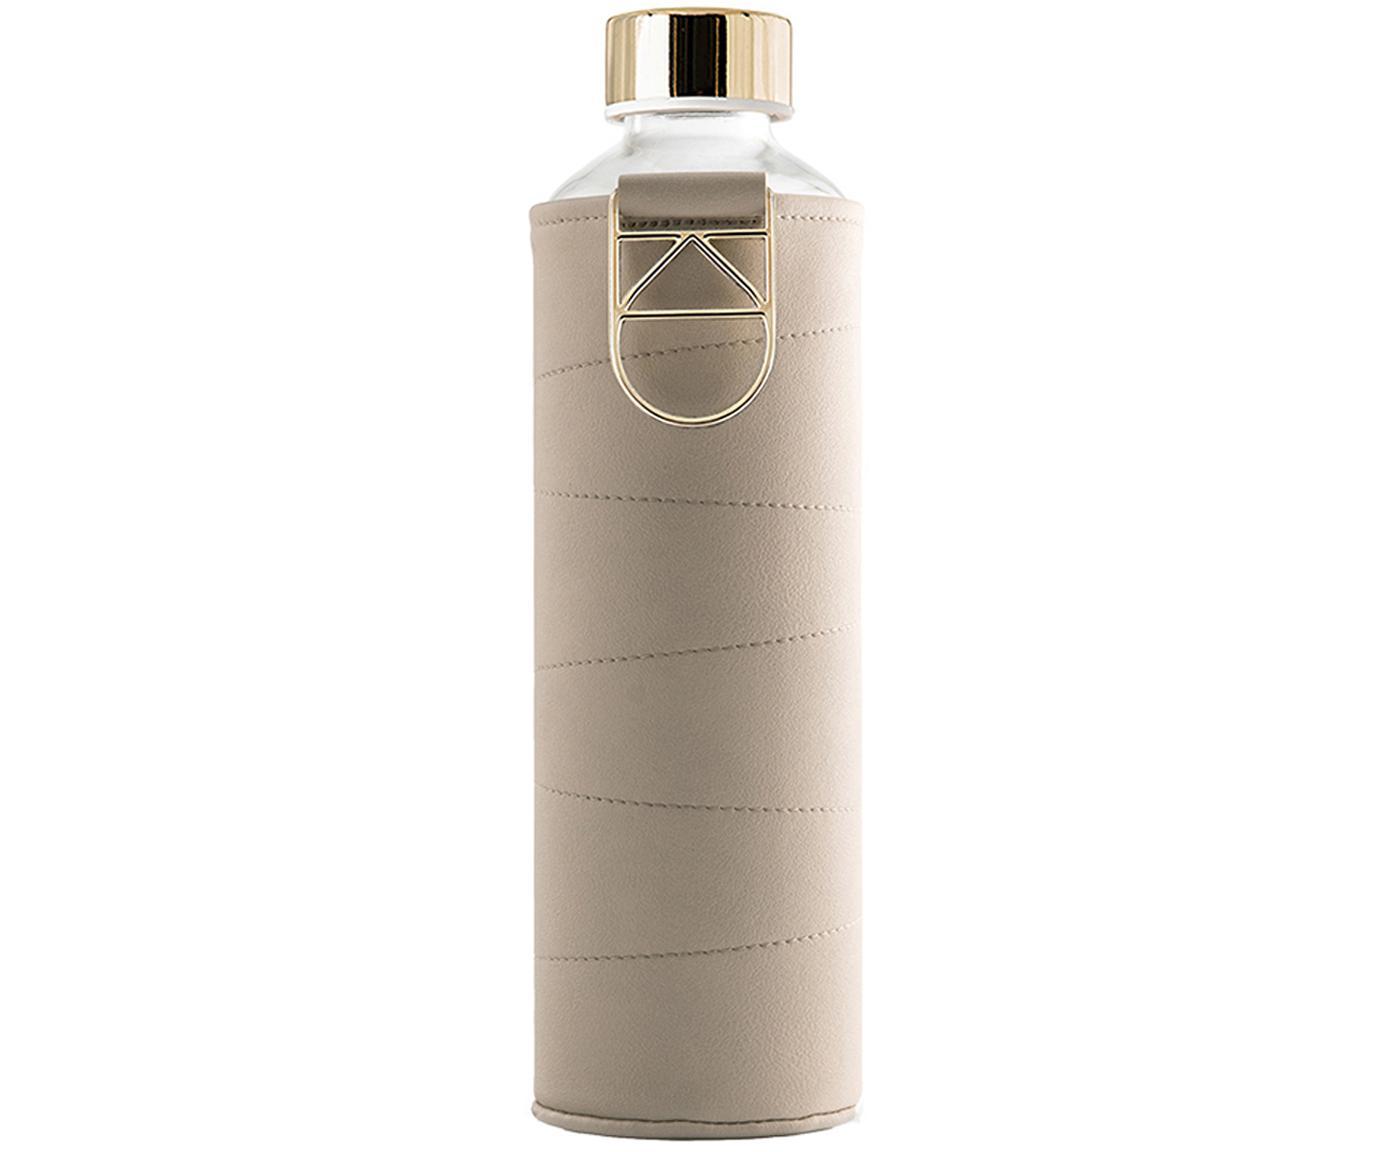 Botella Mismatch, Botella: vidrio borosilicato, Funda: cuero sintético, Beige, transparente, Ø 8 x Al 26 cm